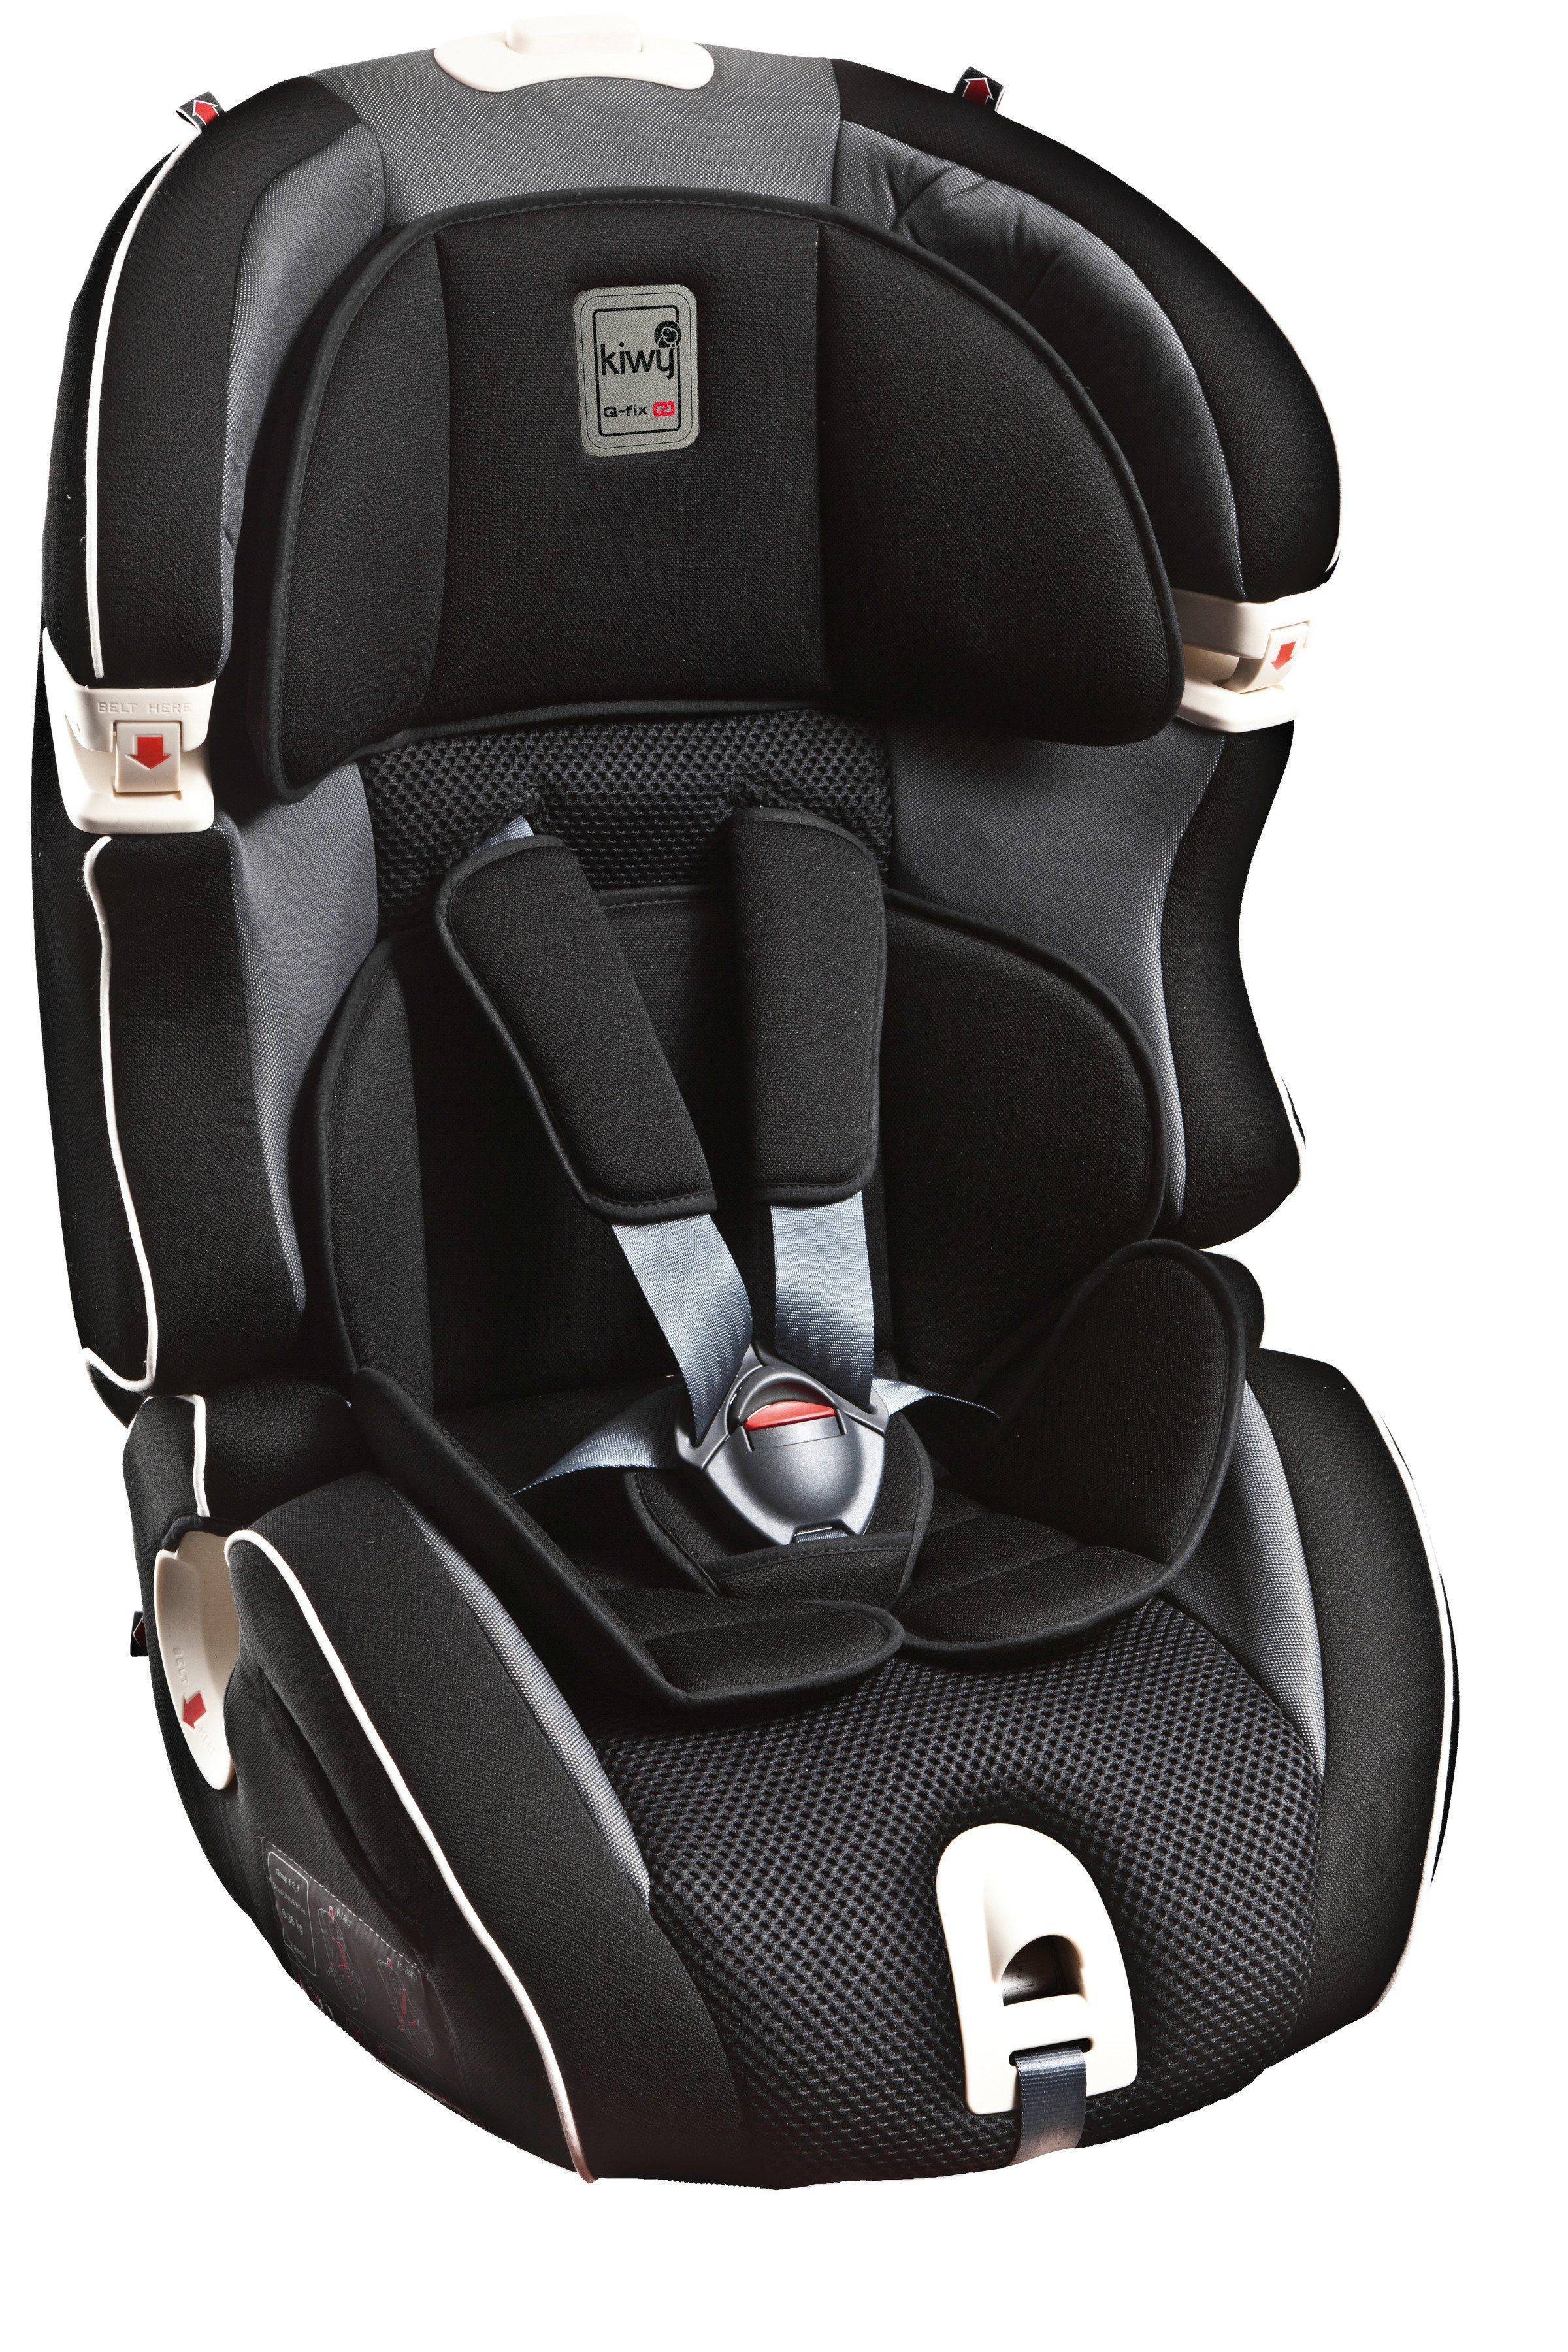 Kiwy Kindersitz »kiwy SL123 Universal, carbon«